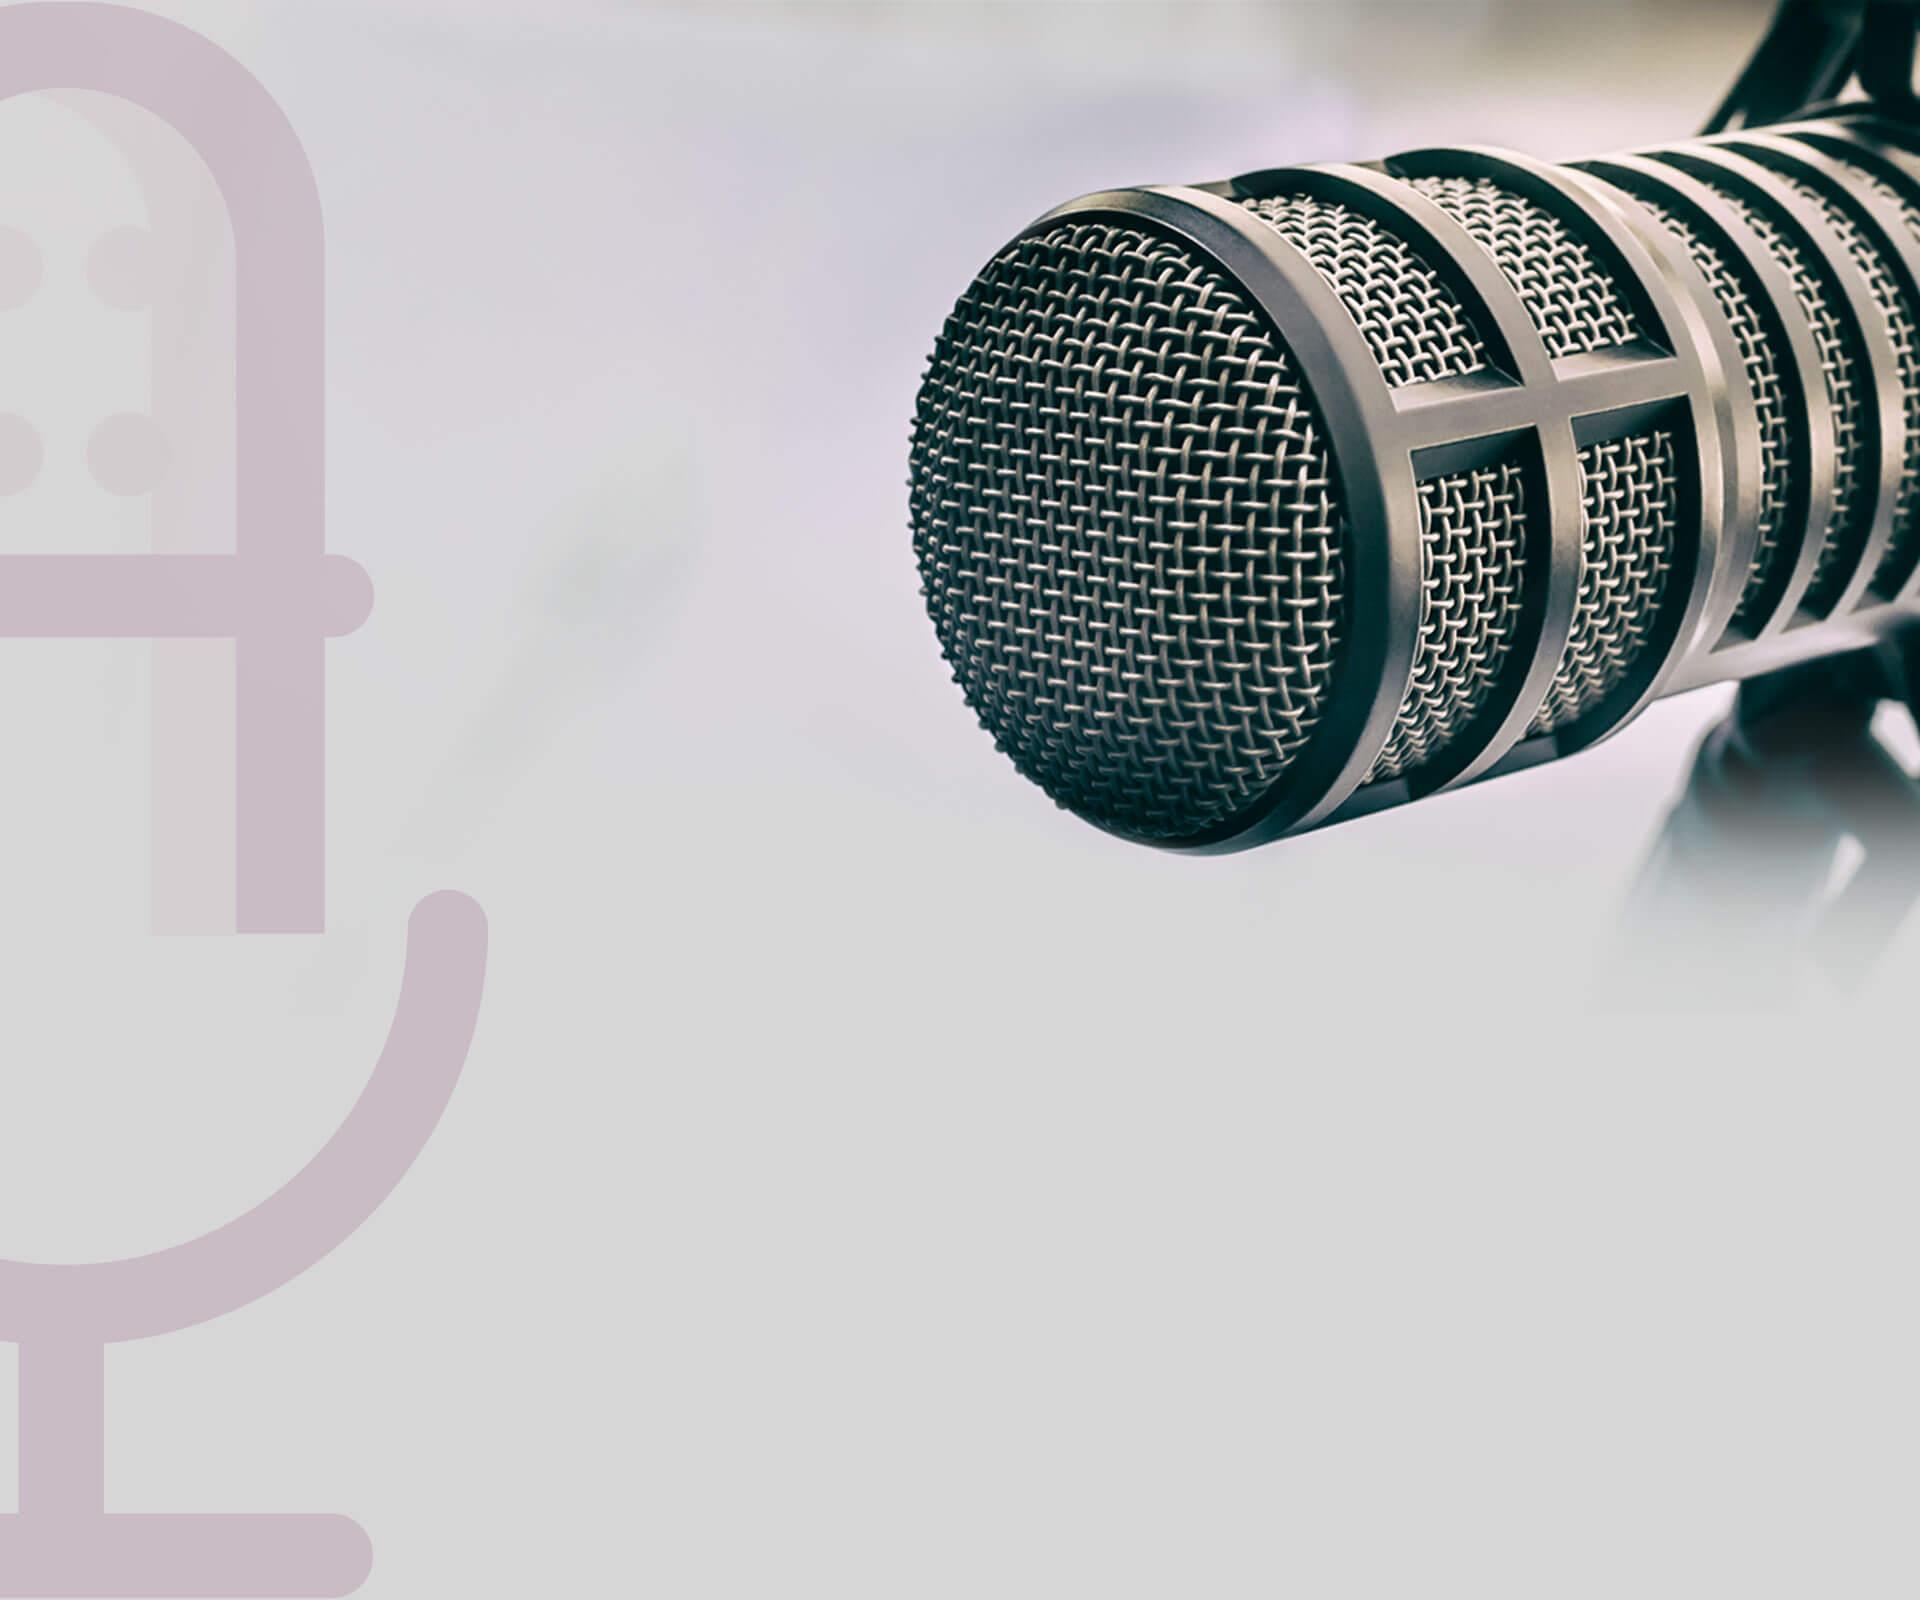 <img class='headline_img' src='/wp-content/uploads/2020/10/Logo_podcast_fix.png' style='width:25%;'>